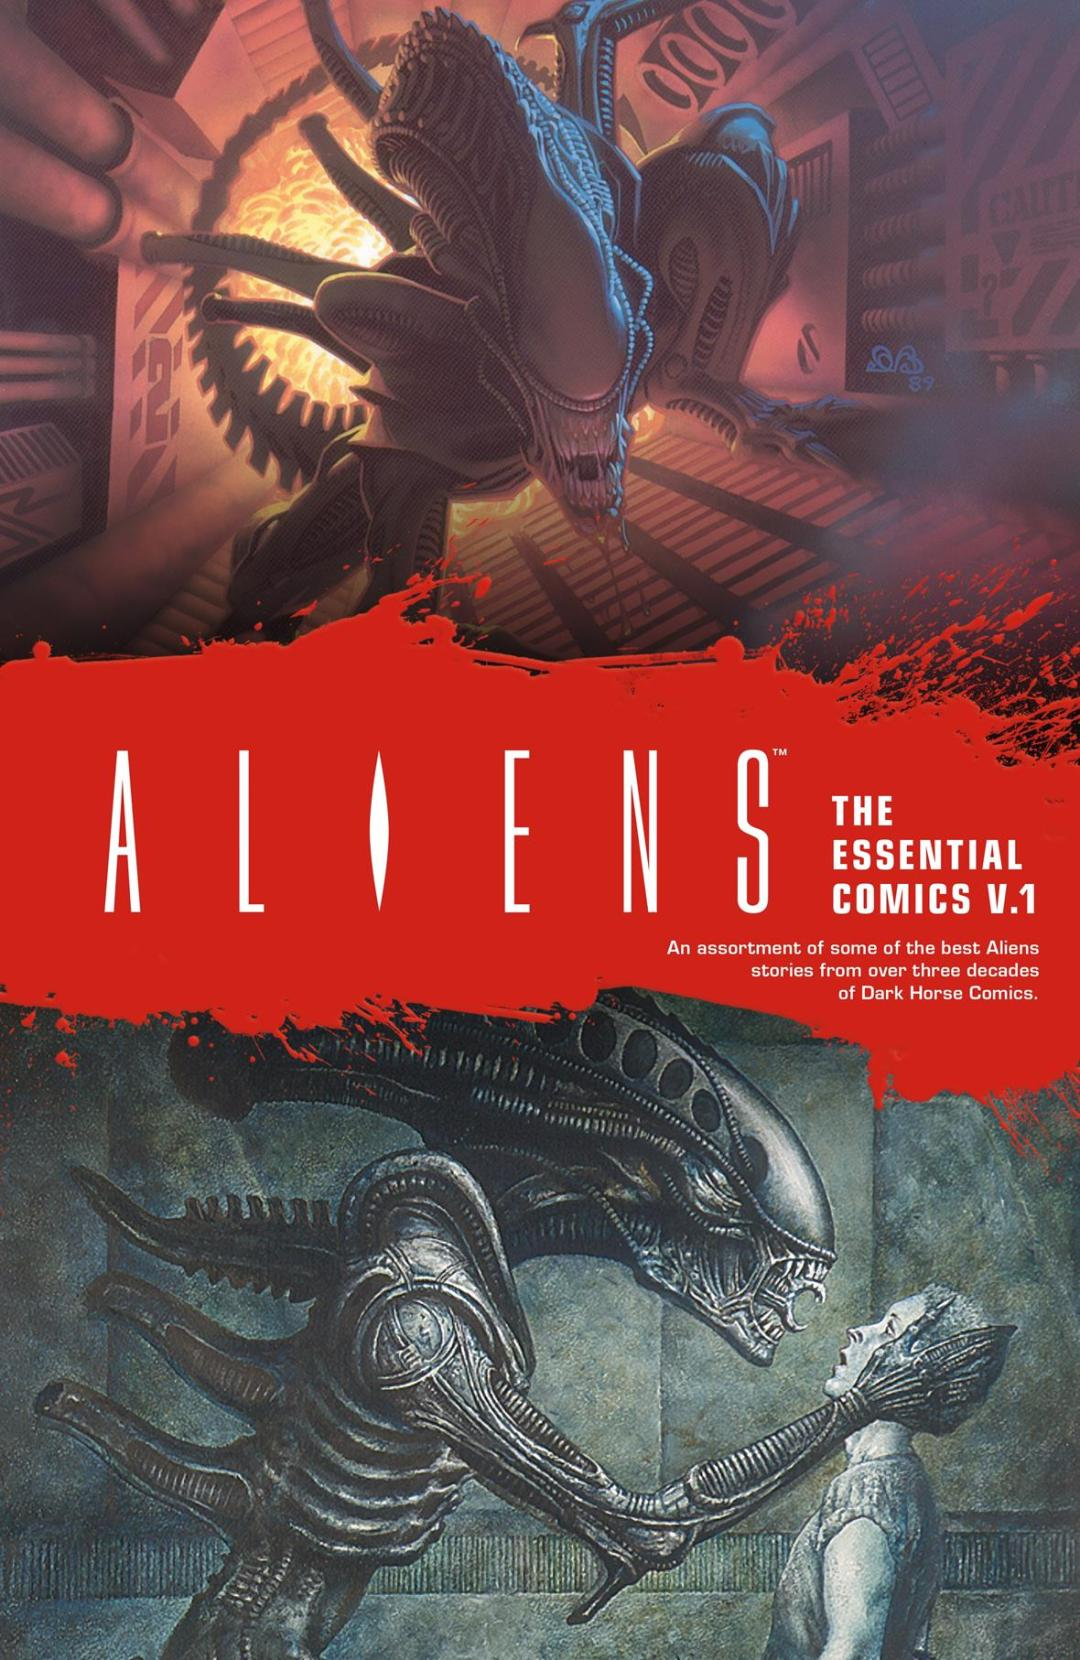 Dark Horse Announces New 'Aliens' Essential Collections!